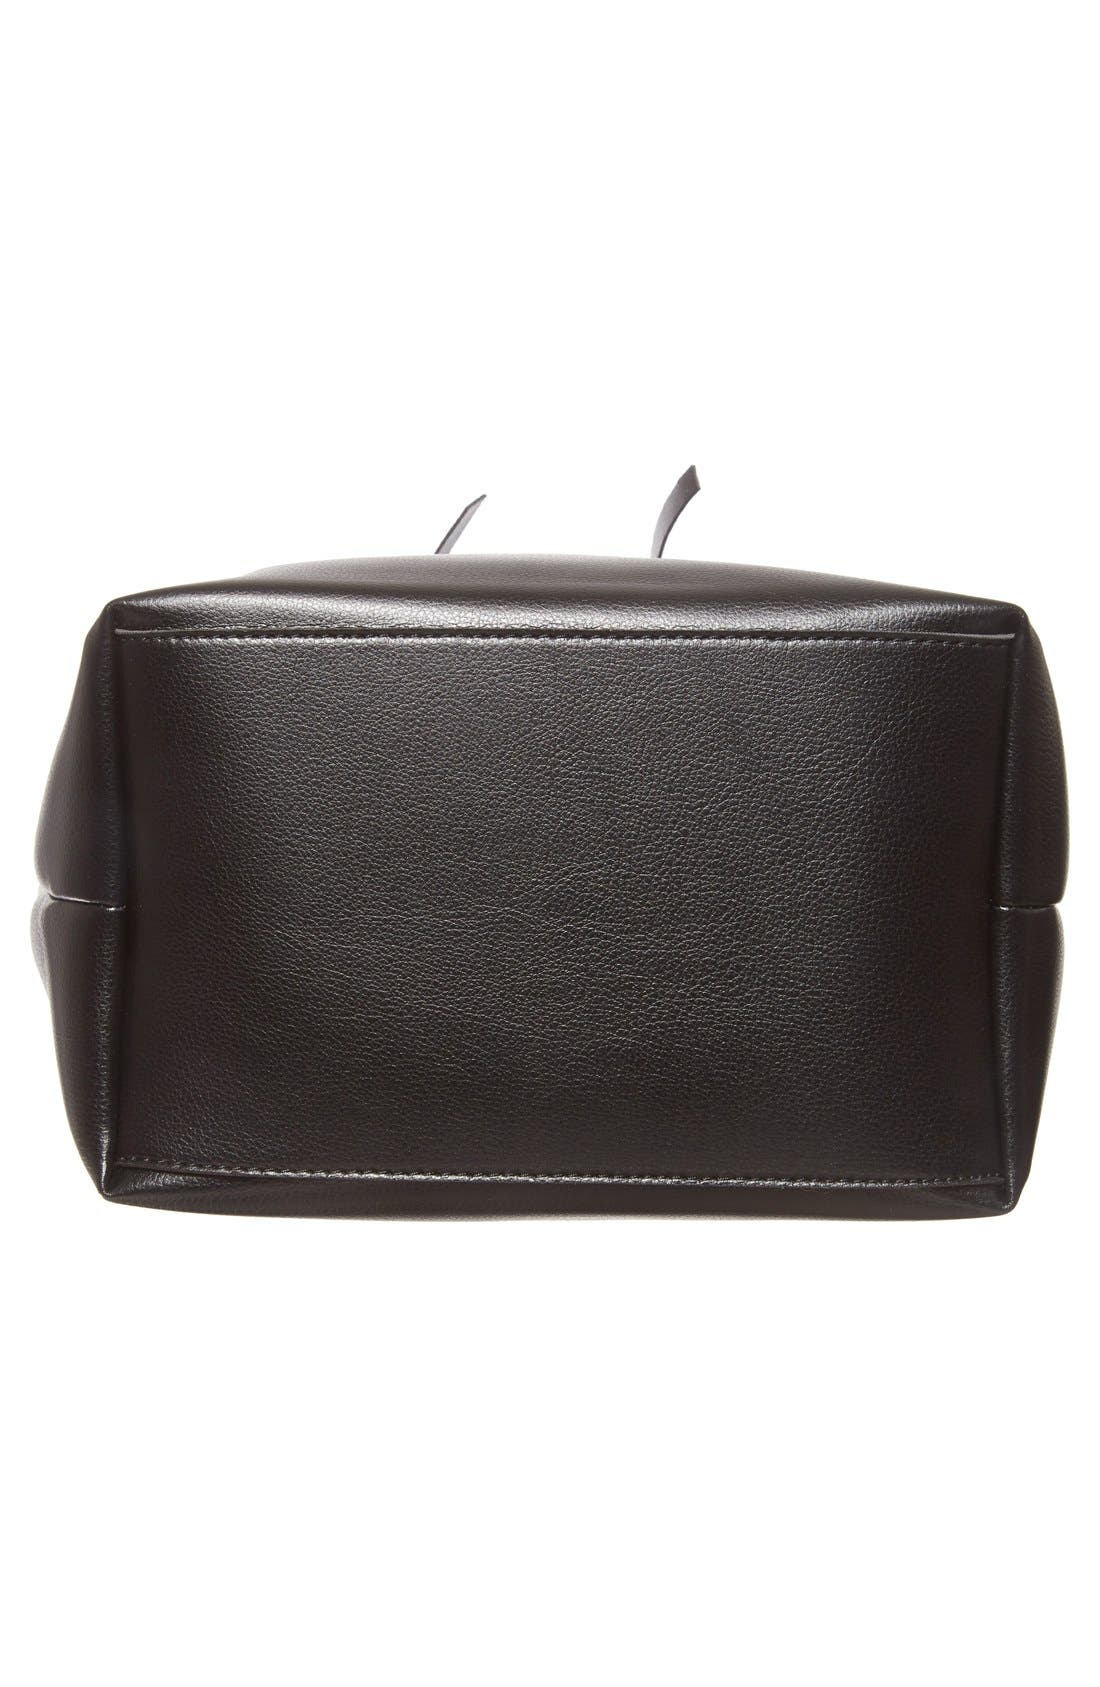 SOLE SOCIETY,                             'Blackwood' Faux Leather Bucket Bag,                             Alternate thumbnail 6, color,                             001